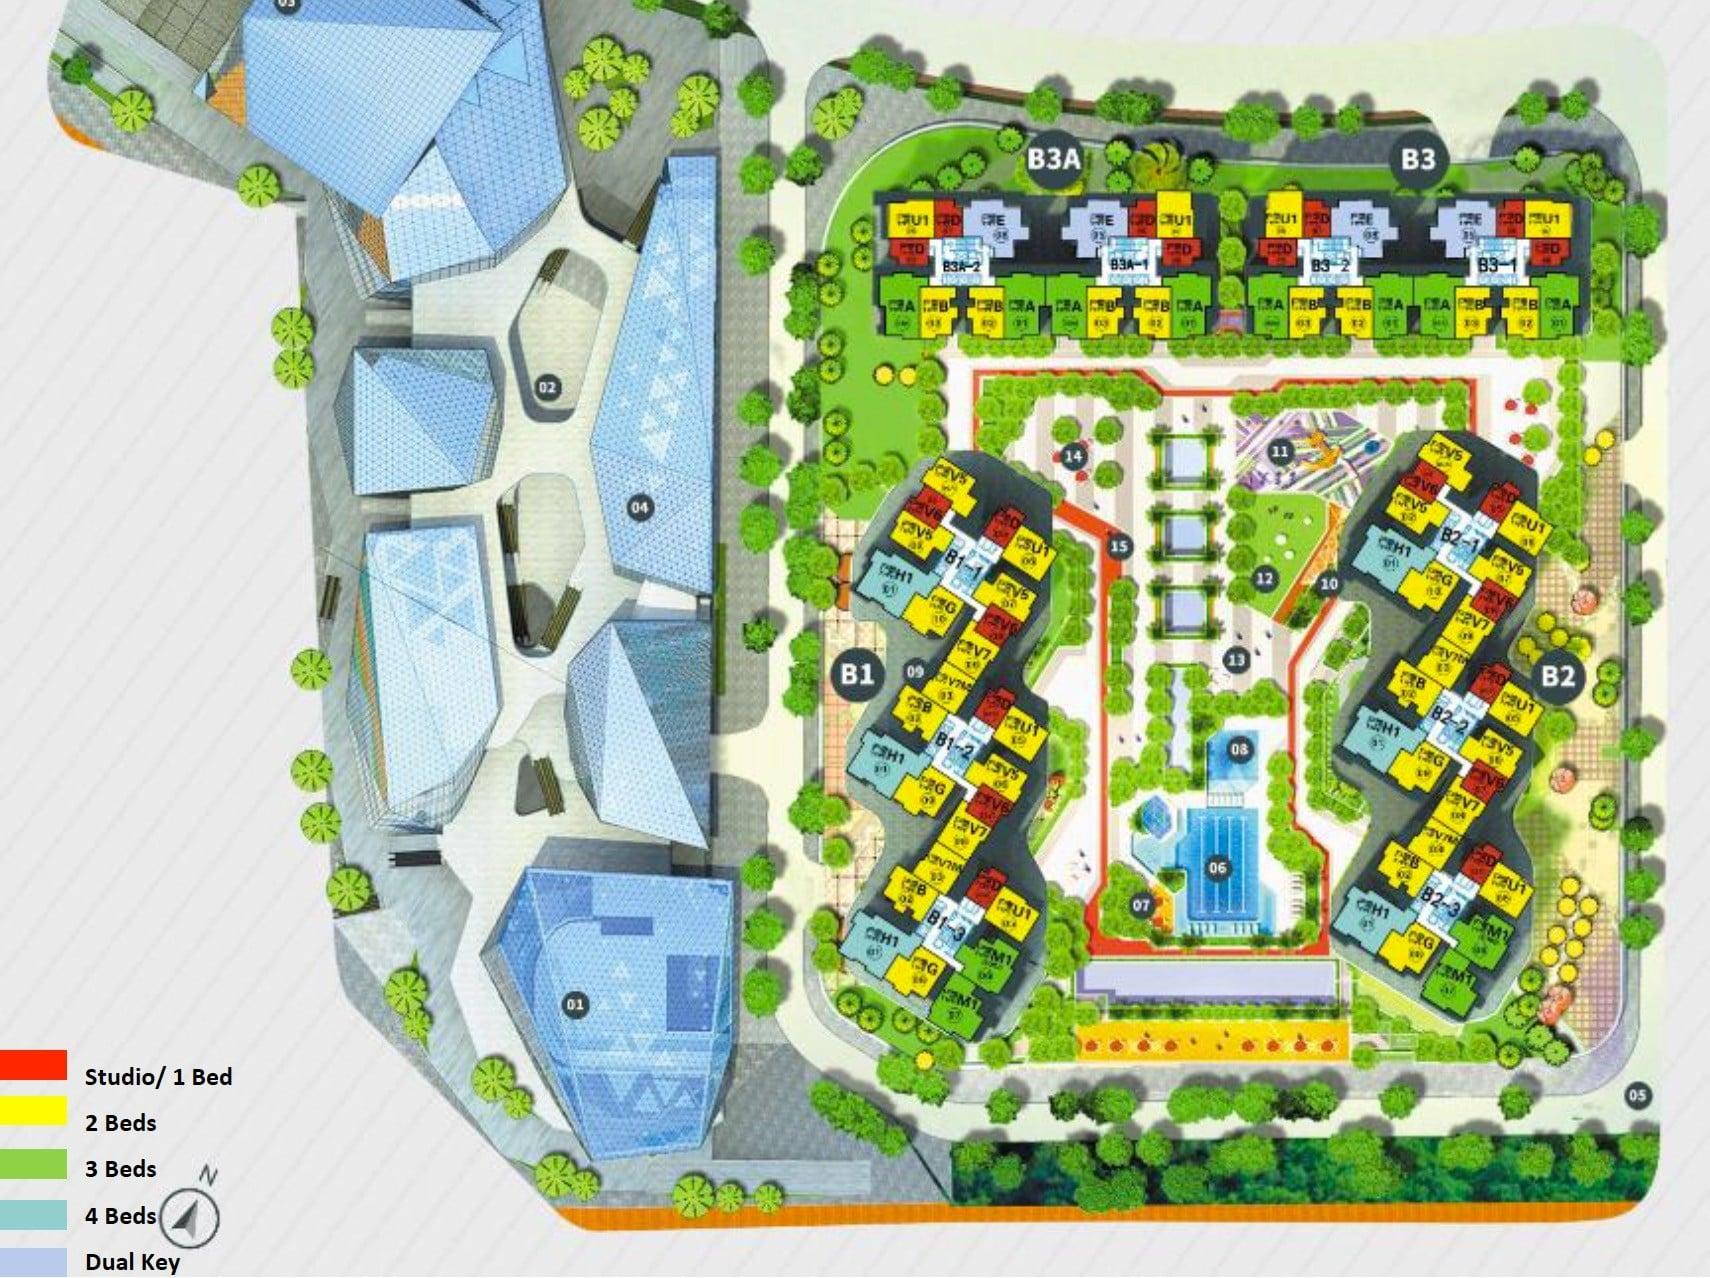 RF Princess Cove JB Site Plan